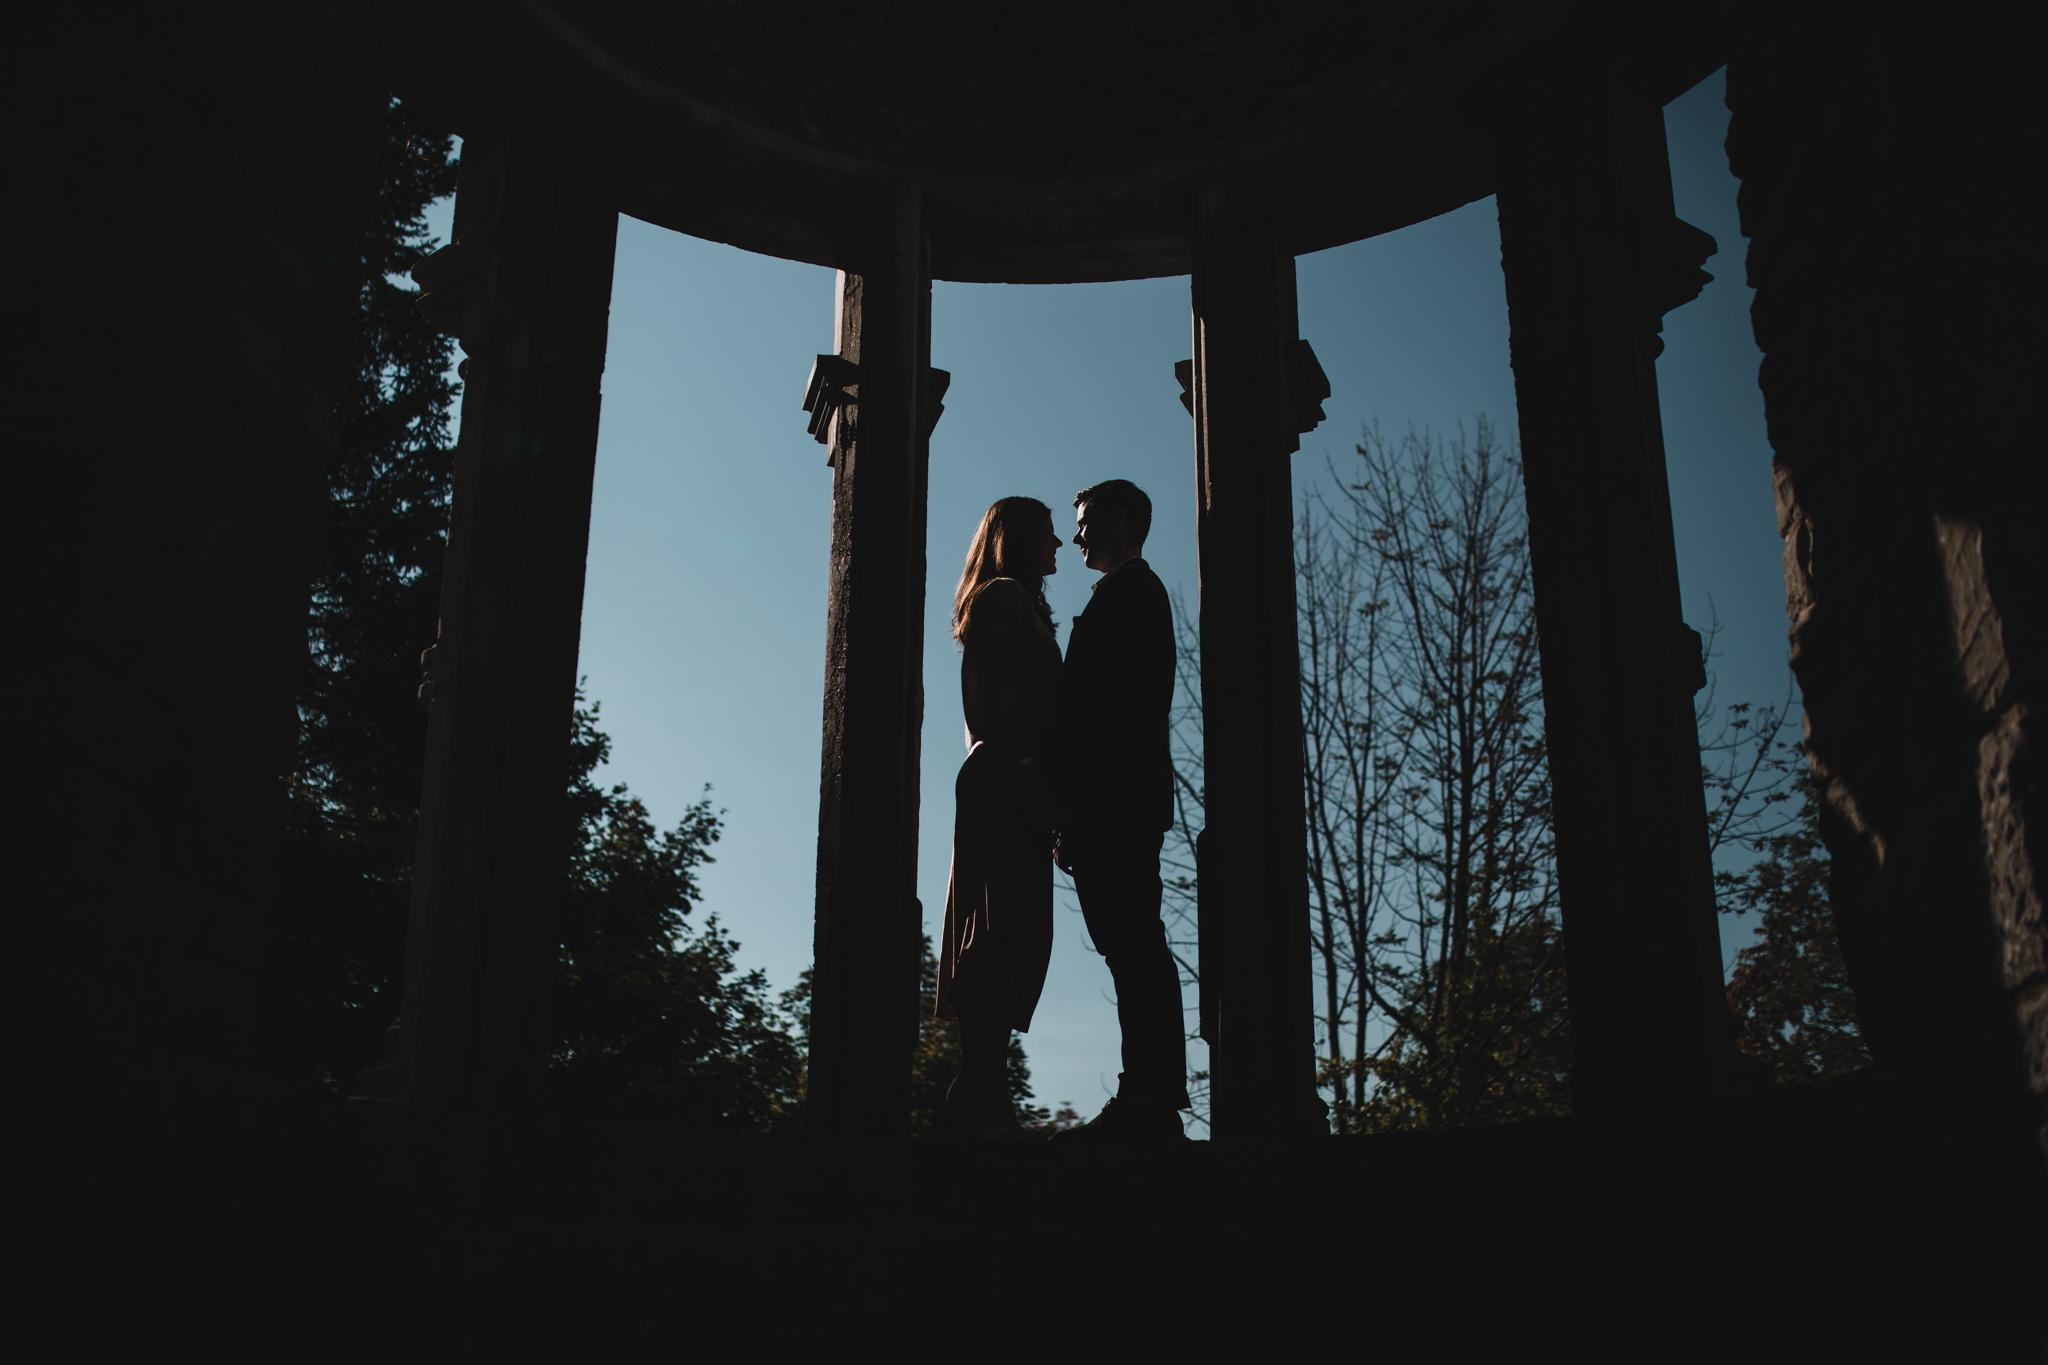 056-WEB-Jonathan-Kuhn-Photography-Amanda-Brennen-Engagement-6539.jpg